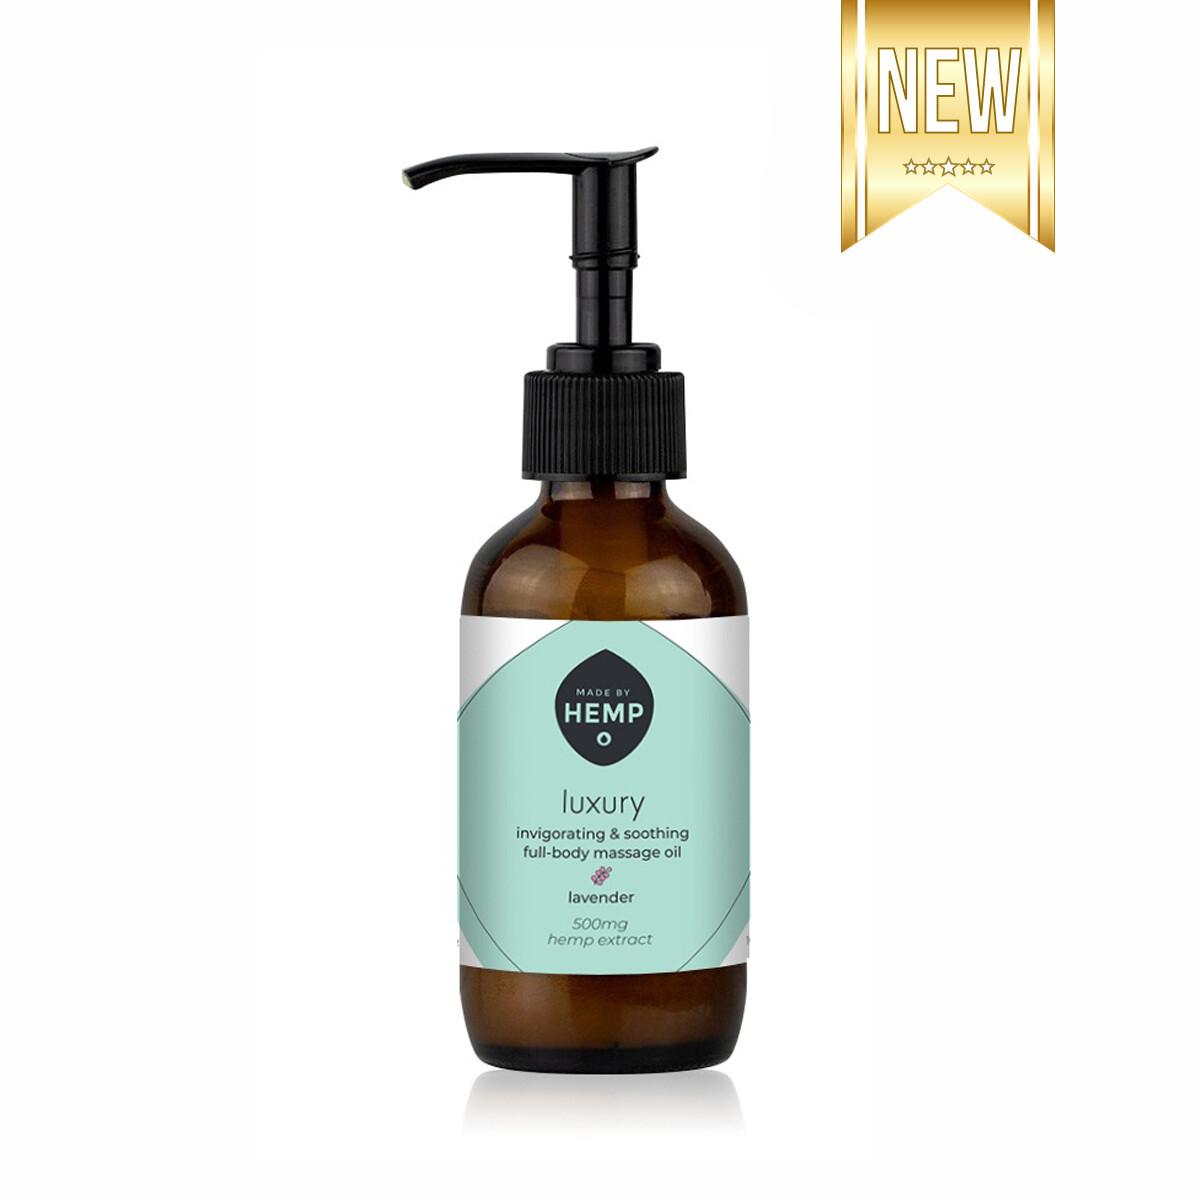 Made By Hemp – Luxurious CBD Massage Oil (500mg)